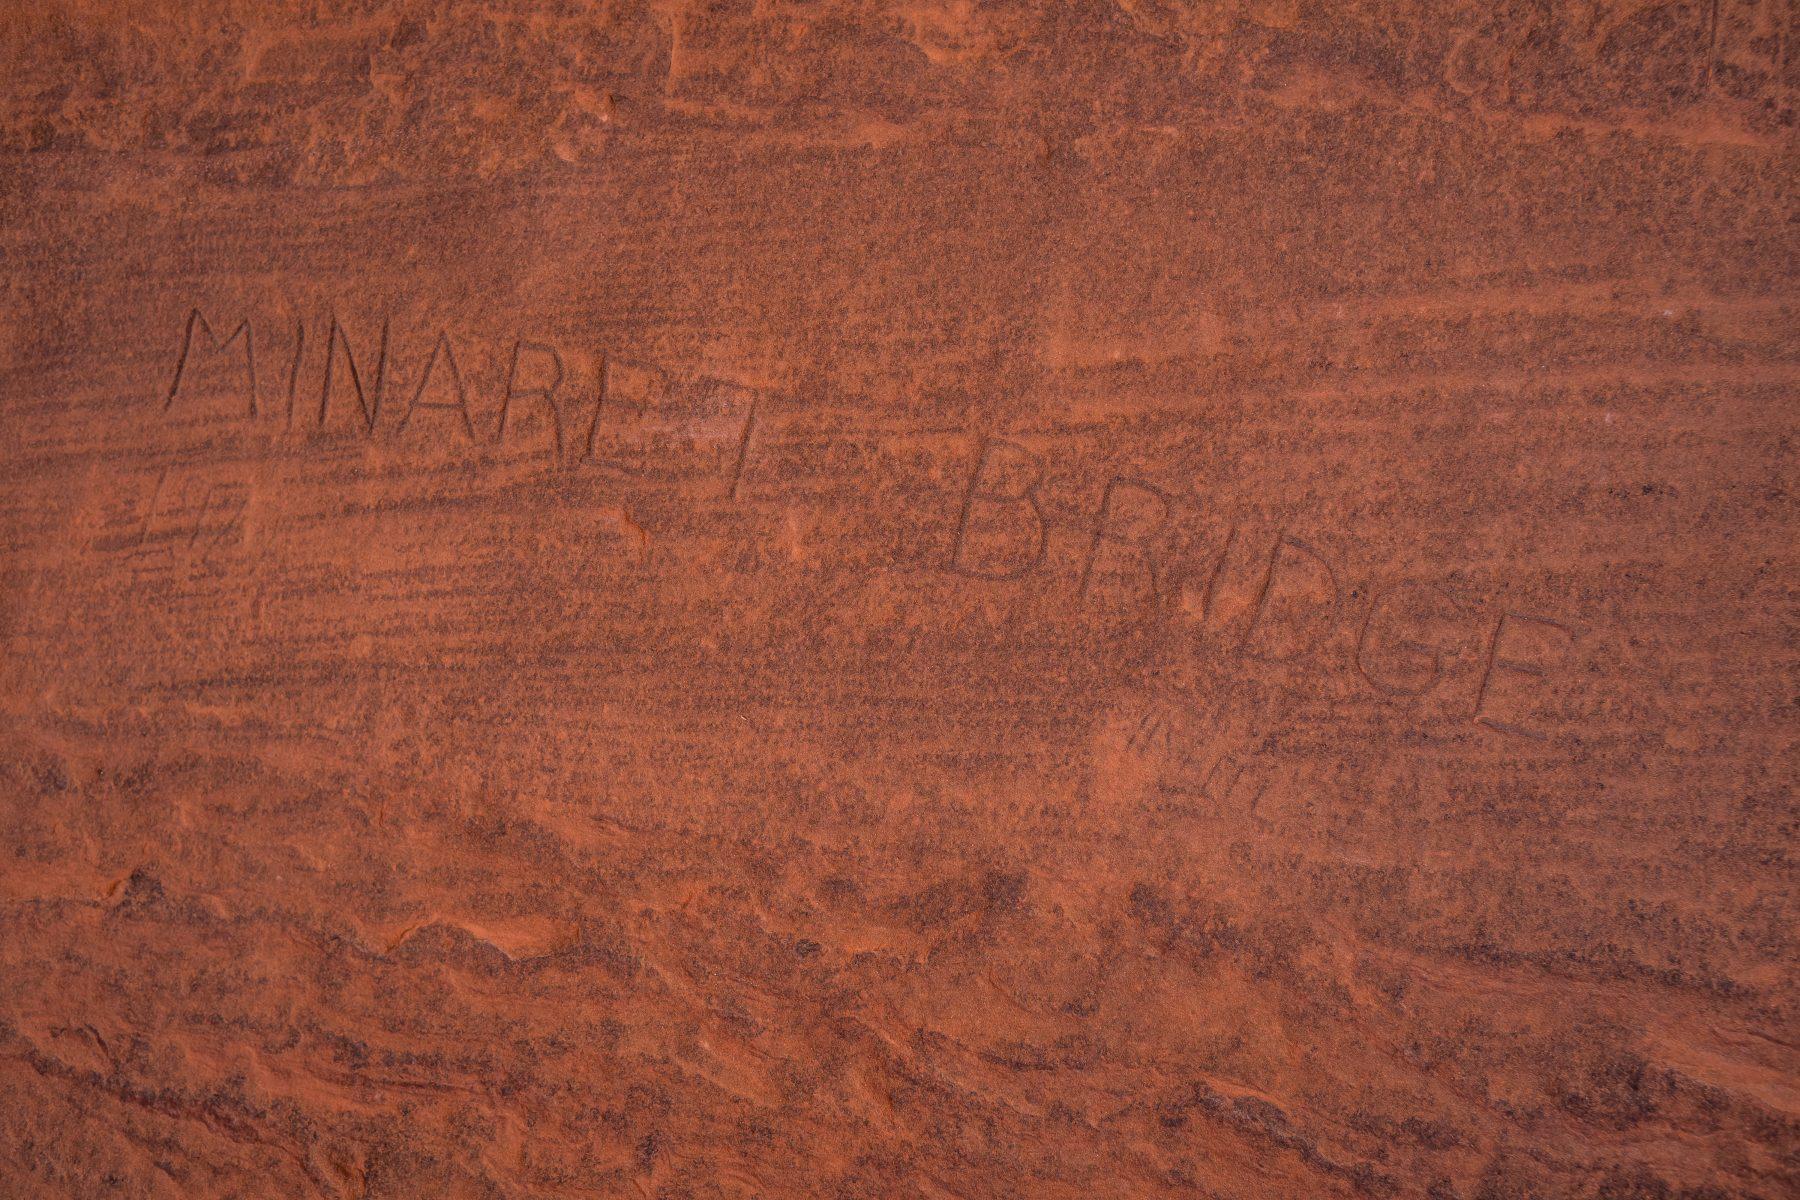 Arches-National-Park-Tower-Arch-Inscription